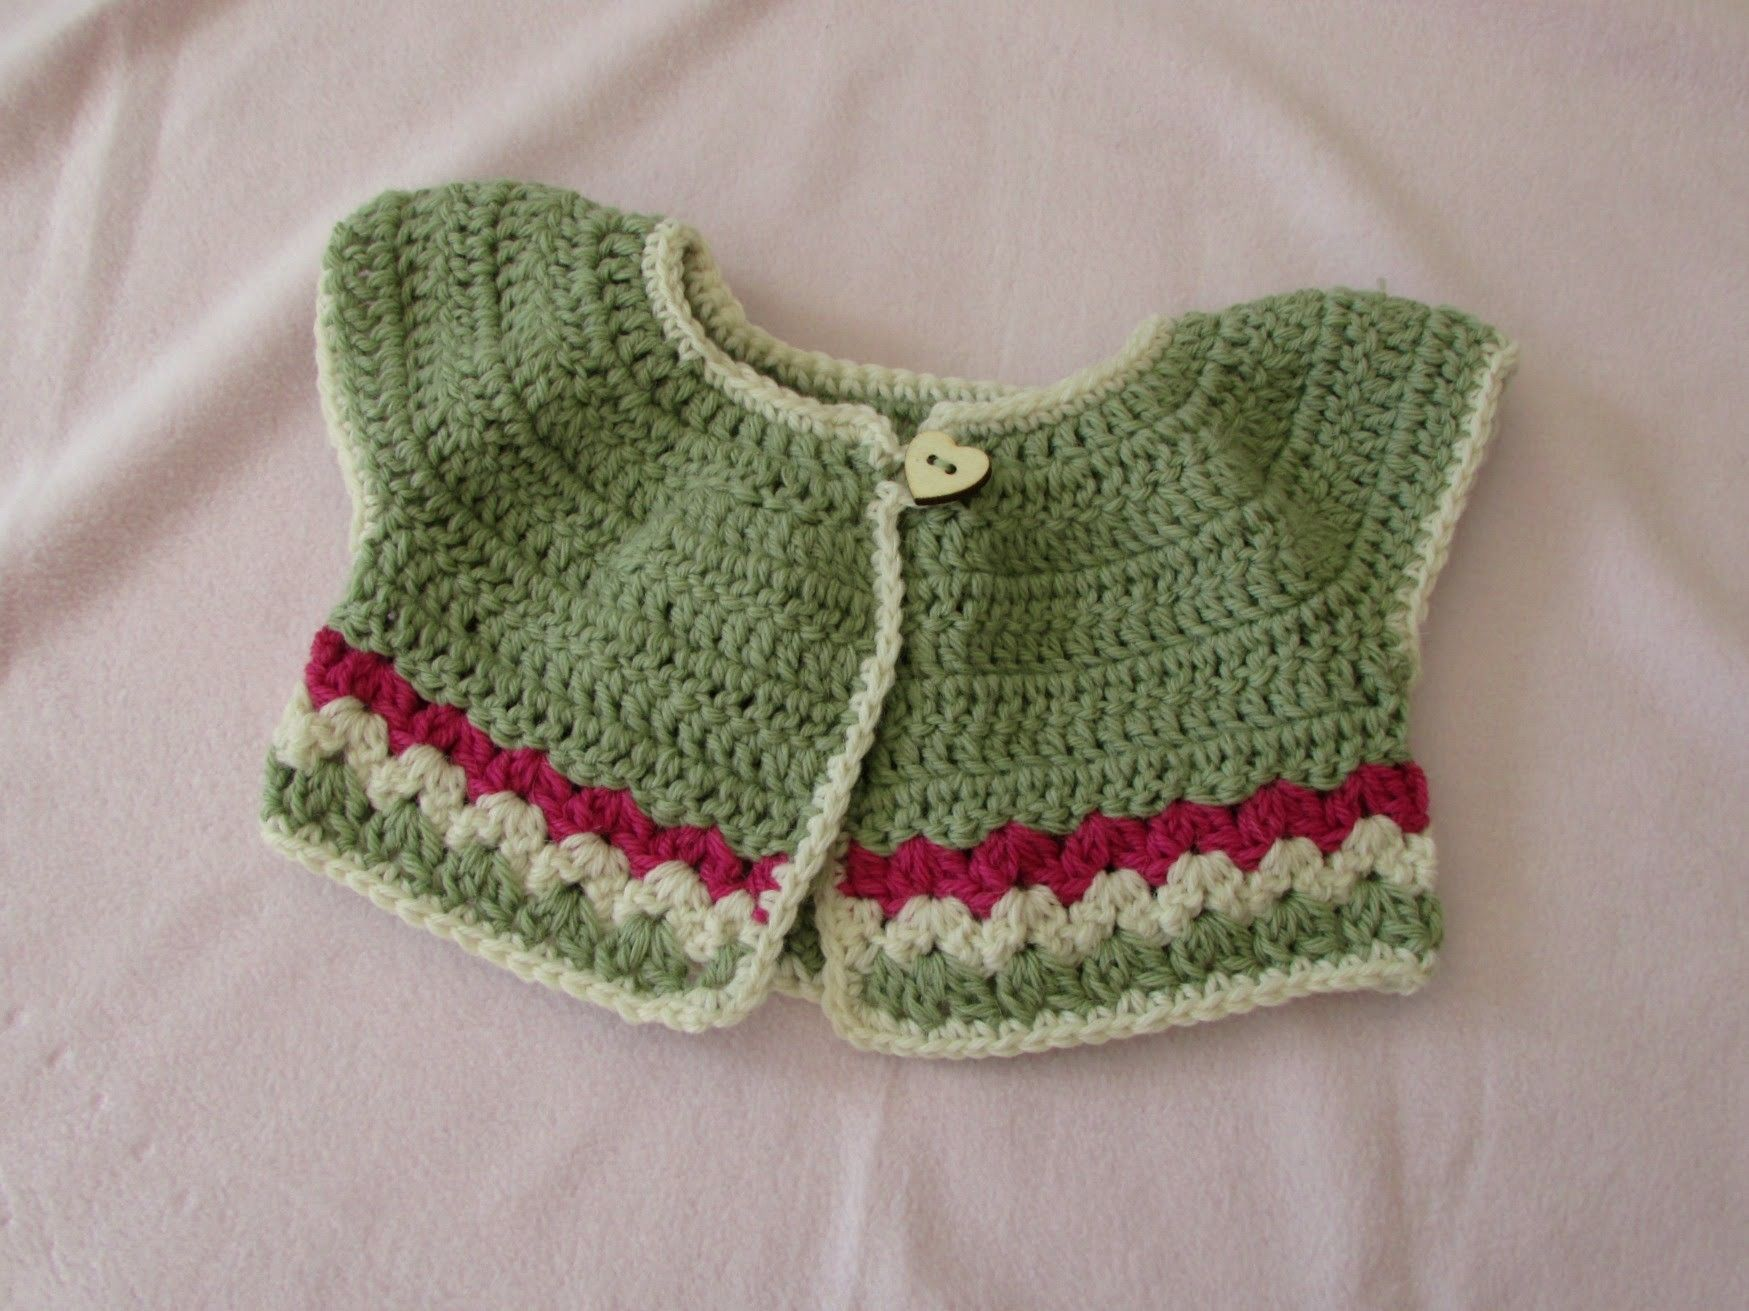 ff6ede8a8 VERY EASY crochet baby. girl s summer bolero tutorial - crochet ...